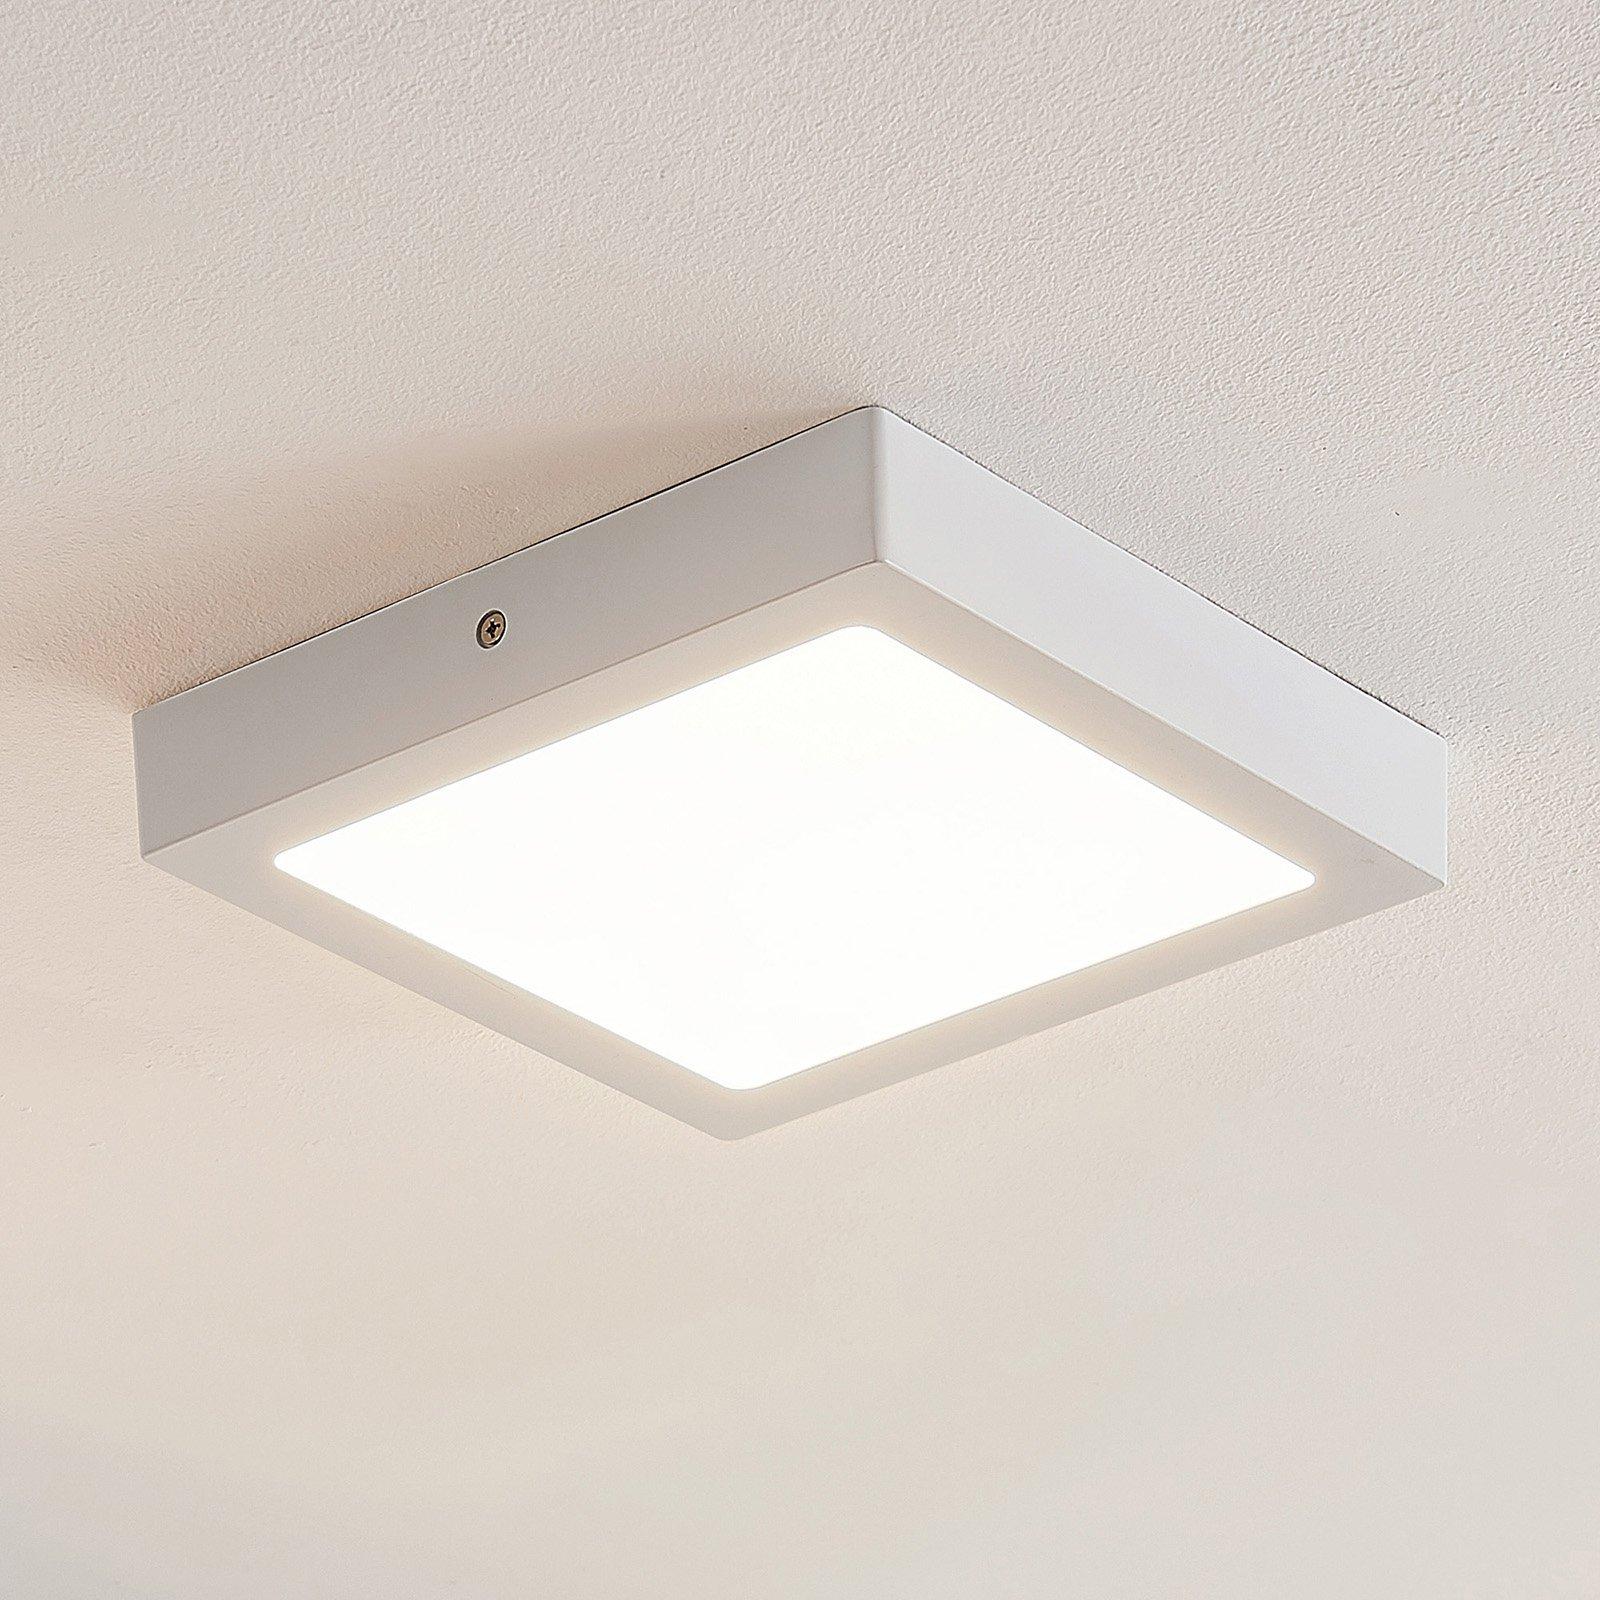 ELC Merina LED-taklampe hvit, 21,5 x 21,5cm